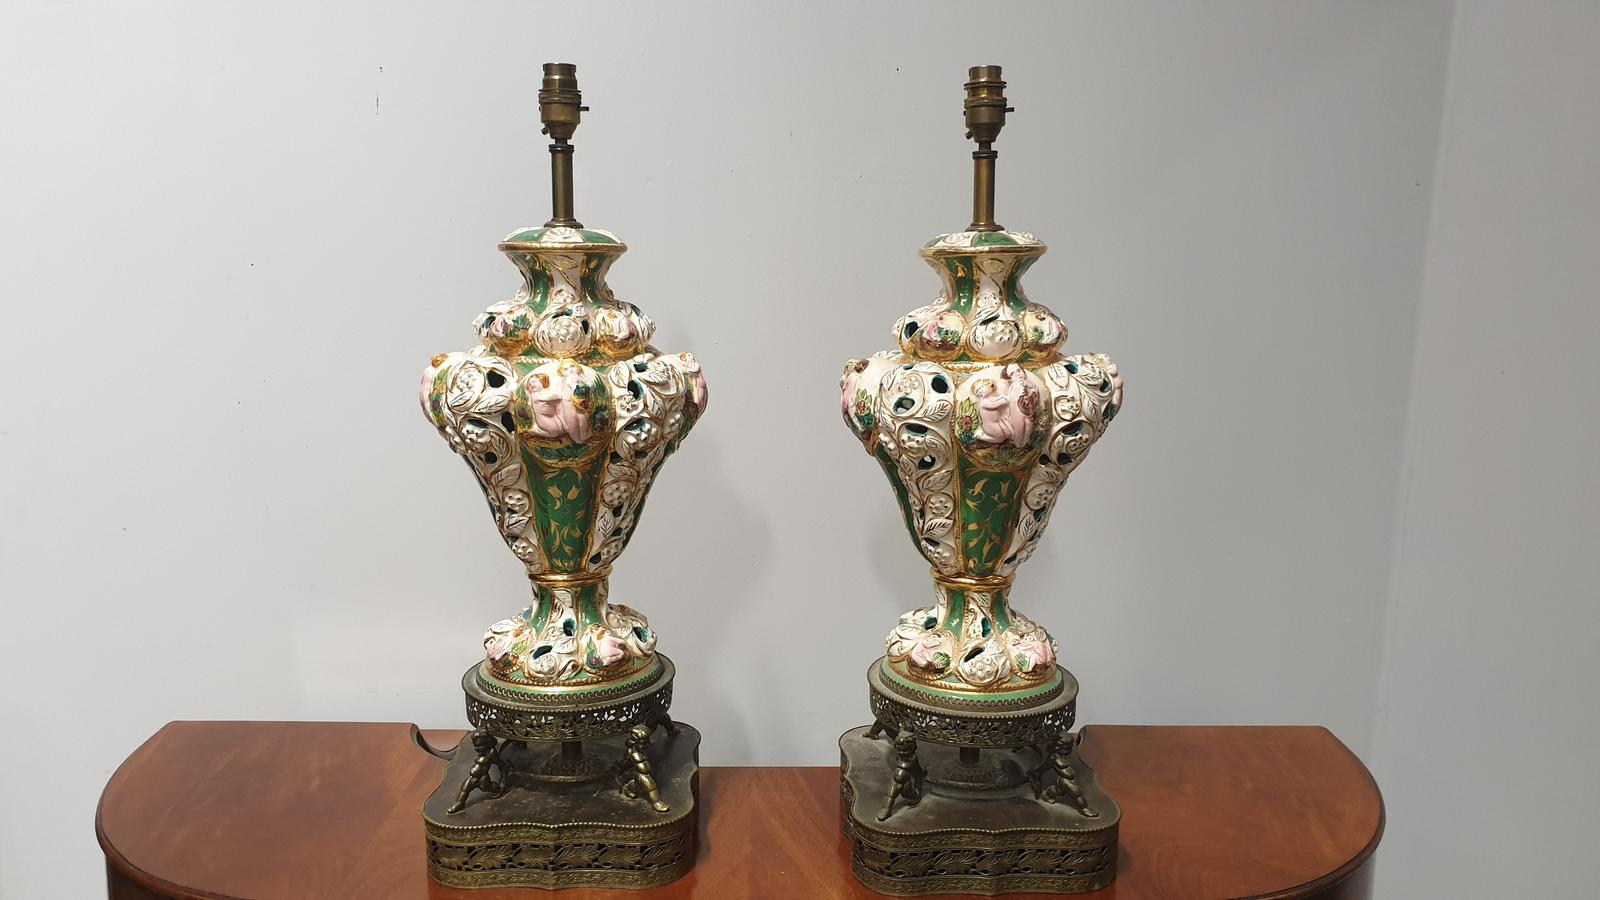 Large Pair of Italian Lamps (1 of 1)